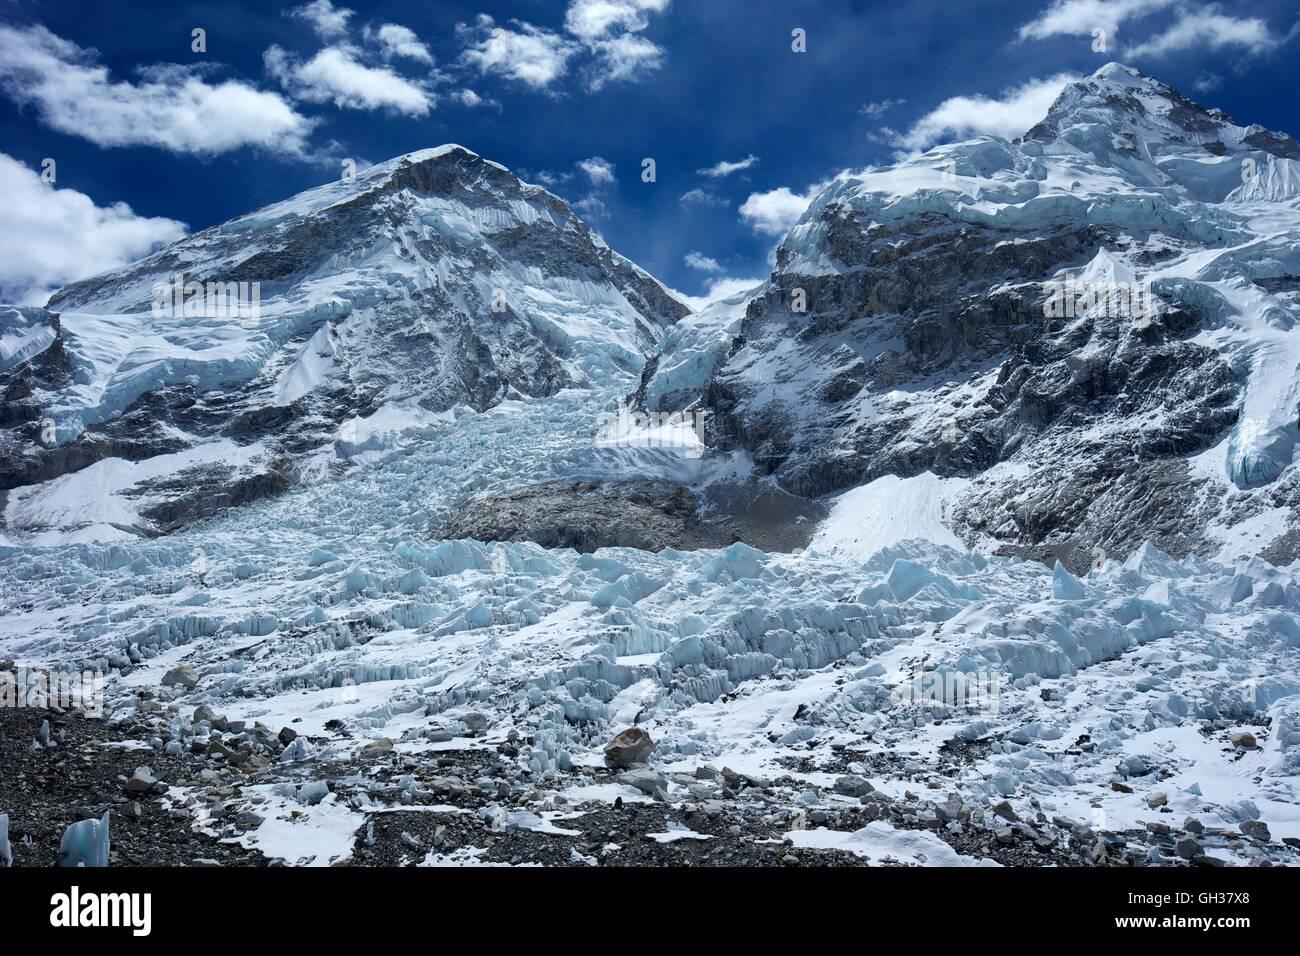 Nuptse, Khumbu icefall and glacier from Everest Base Camp, Sagarmatha National Park, Solukhumbu District, Nepal, - Stock Image